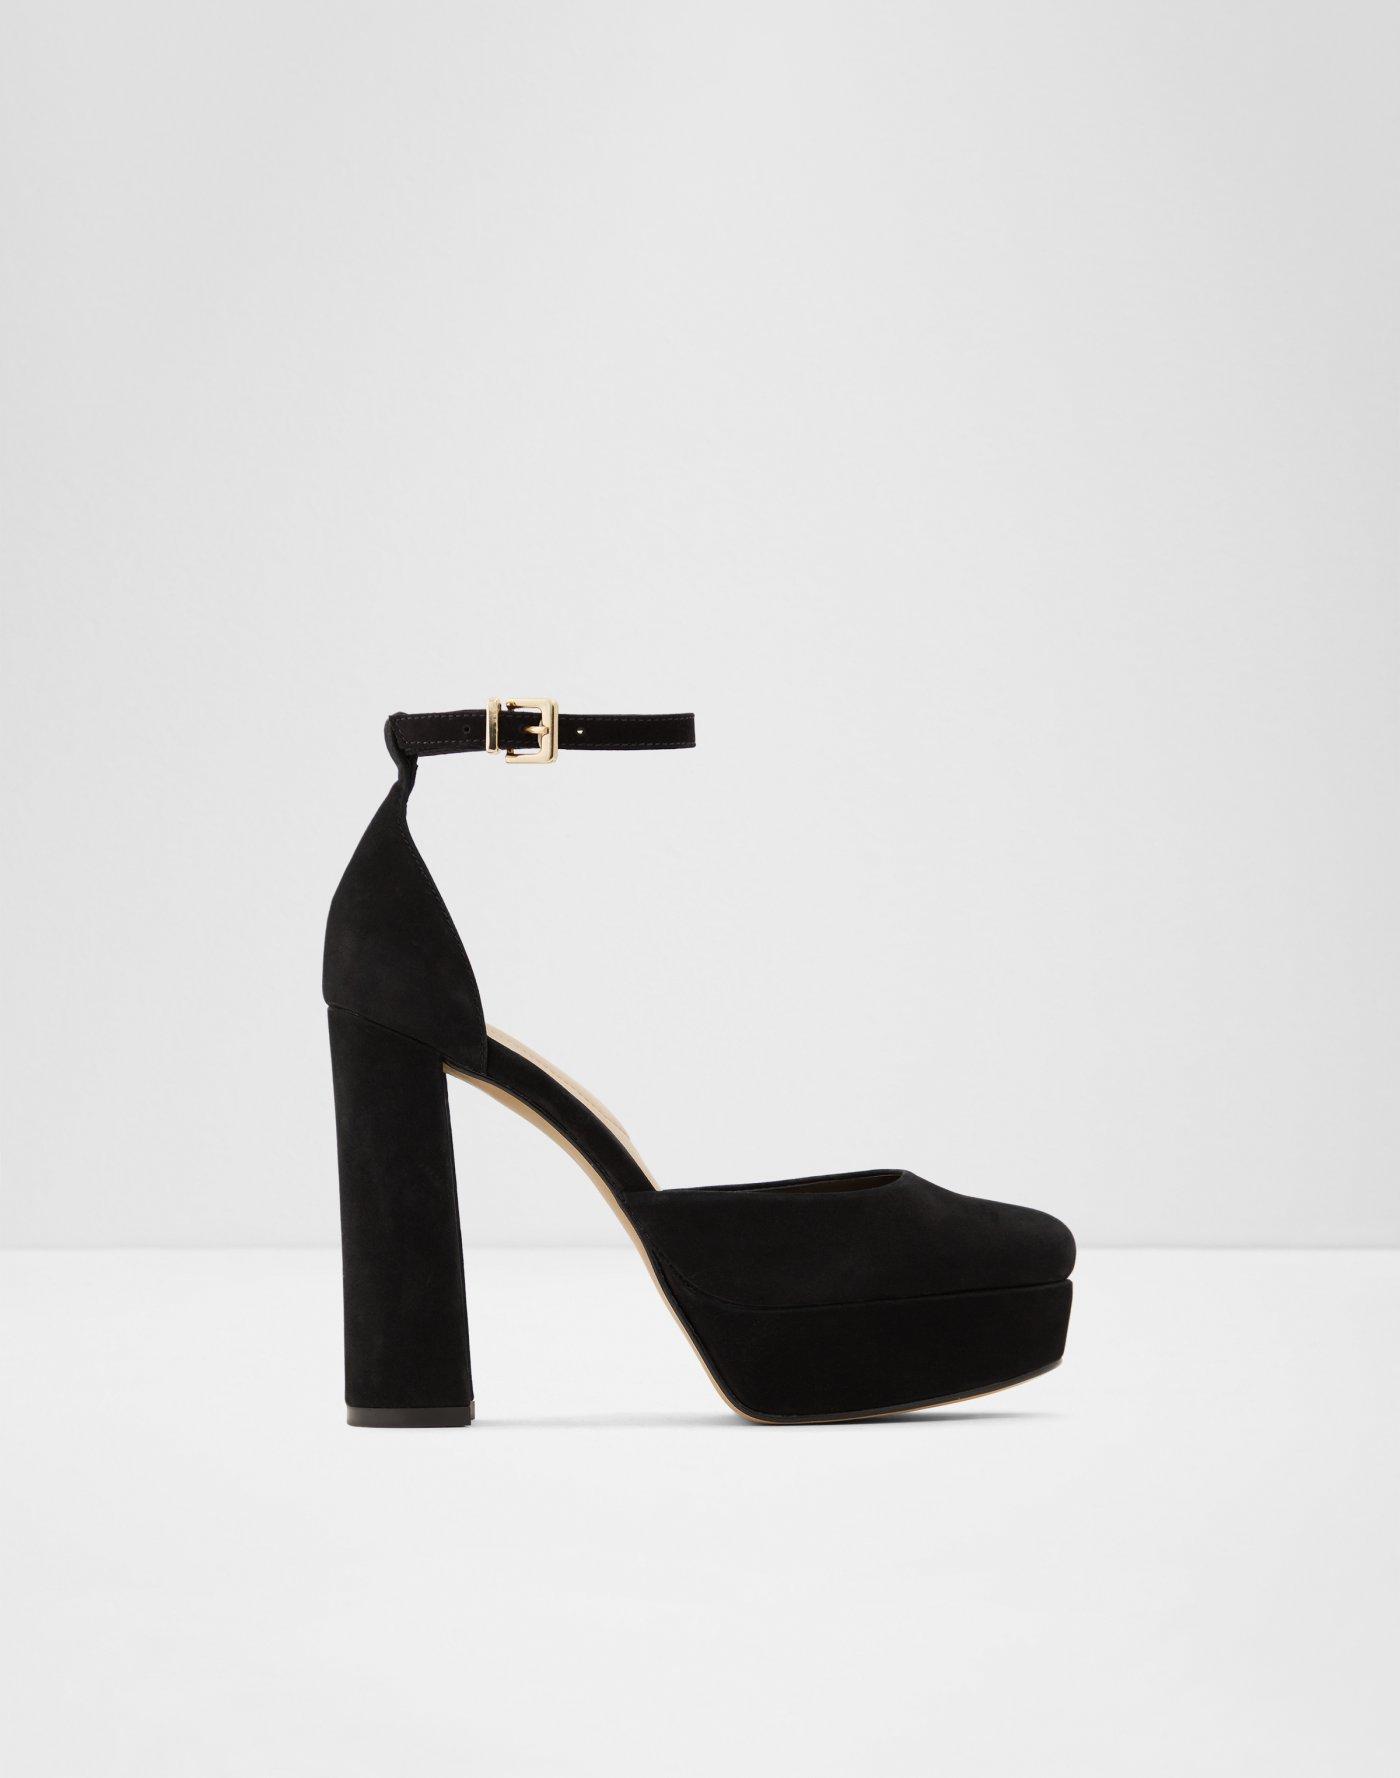 ea6f56c705d75 Heels For Women | Stilettos & High Heels | ALDO Canada | ALDO Canada